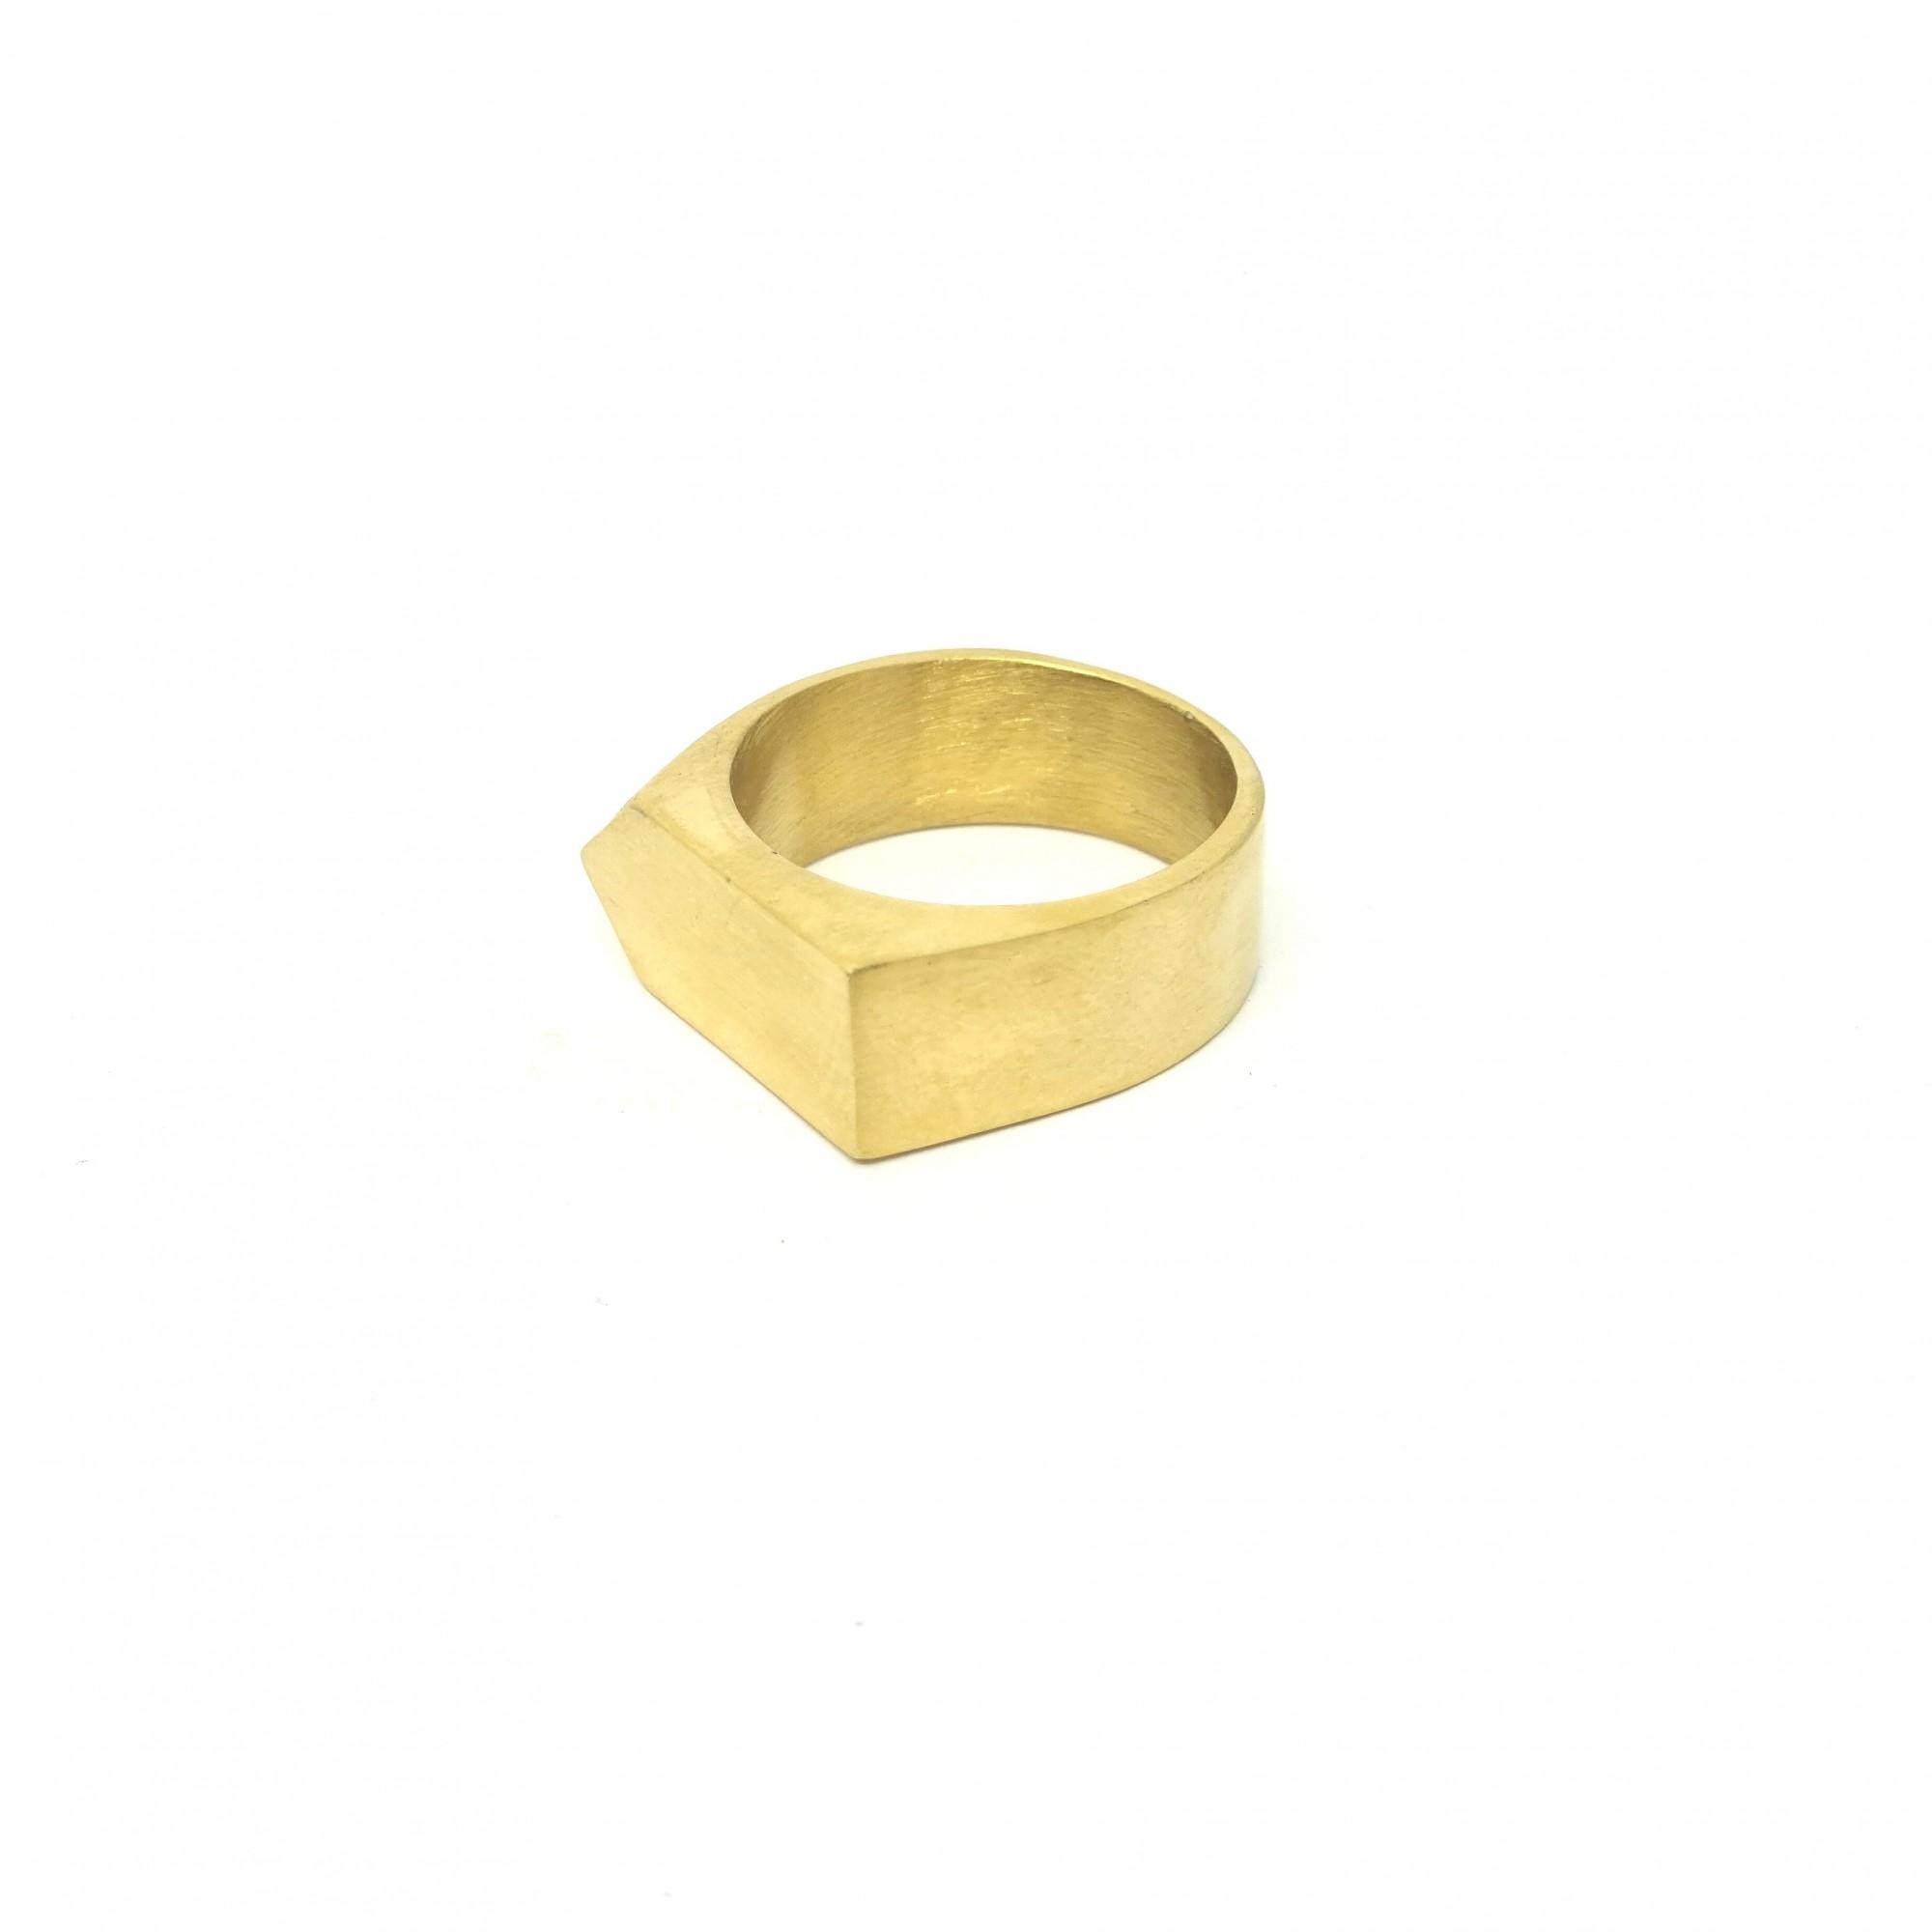 Anel Aço Inox Escovado Masculino Pointed Gold